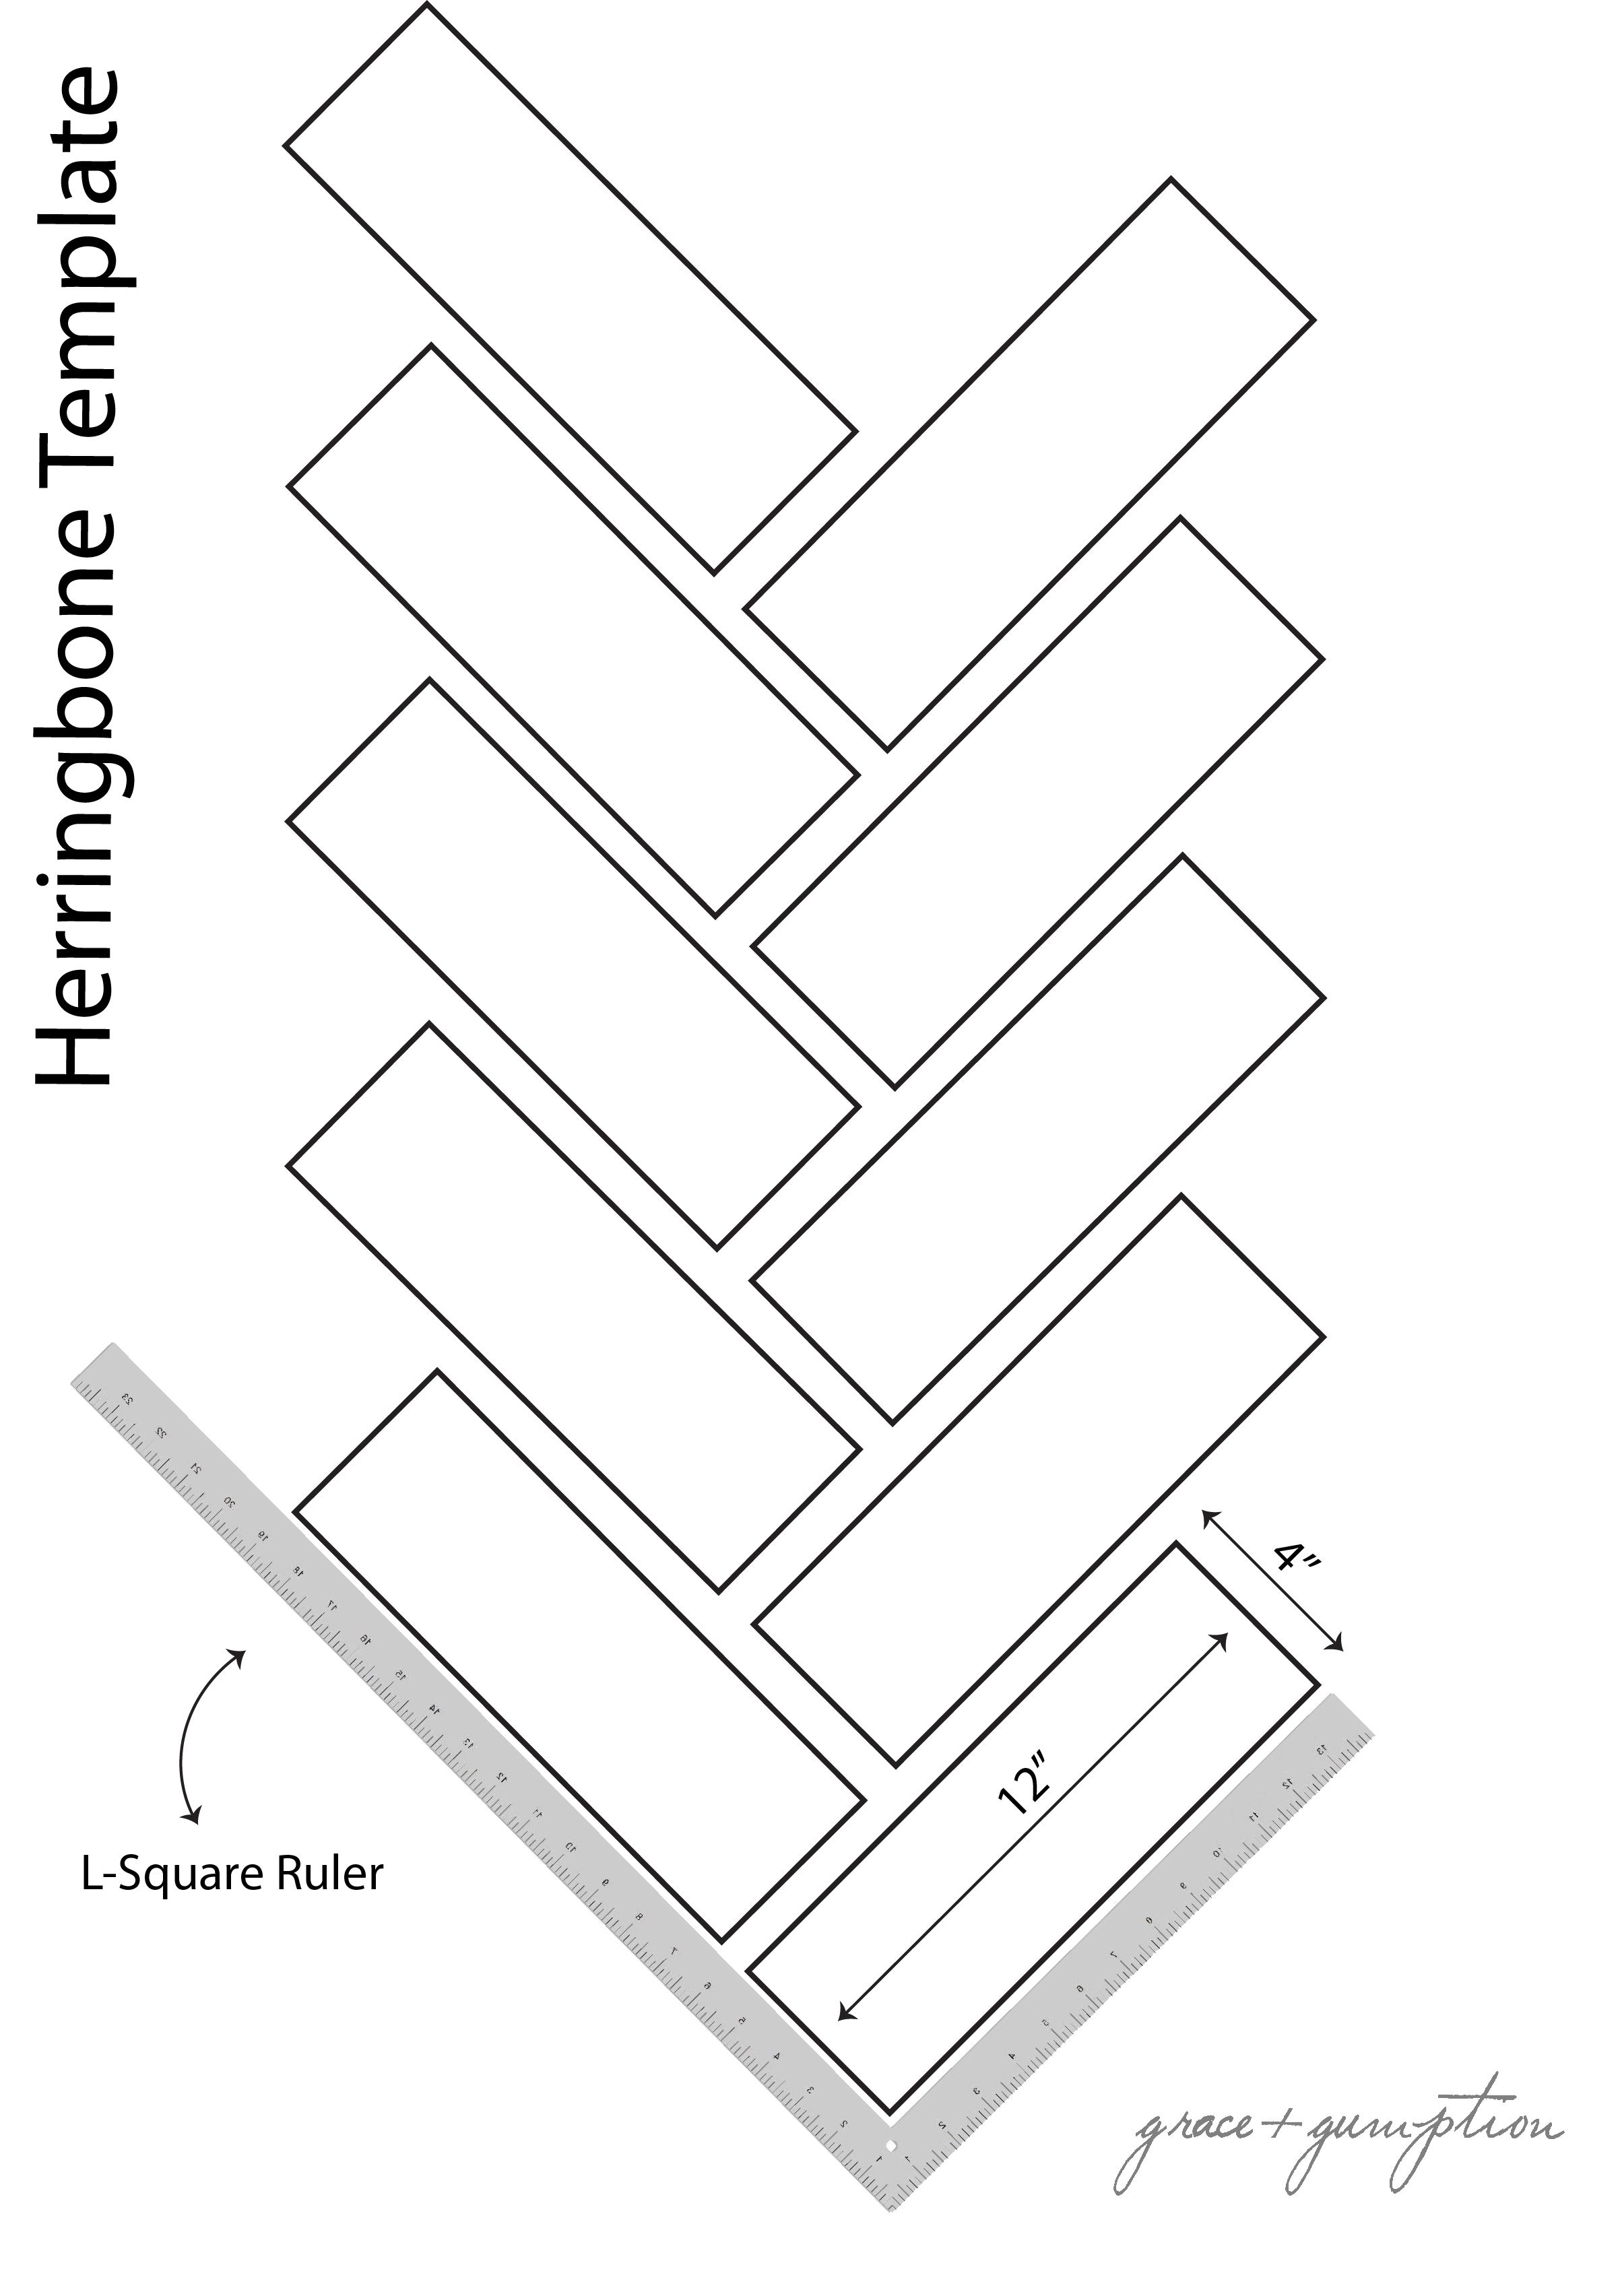 Herringbone pattern template via grace gumption furniture herringbone pattern template via grace gumption dailygadgetfo Choice Image